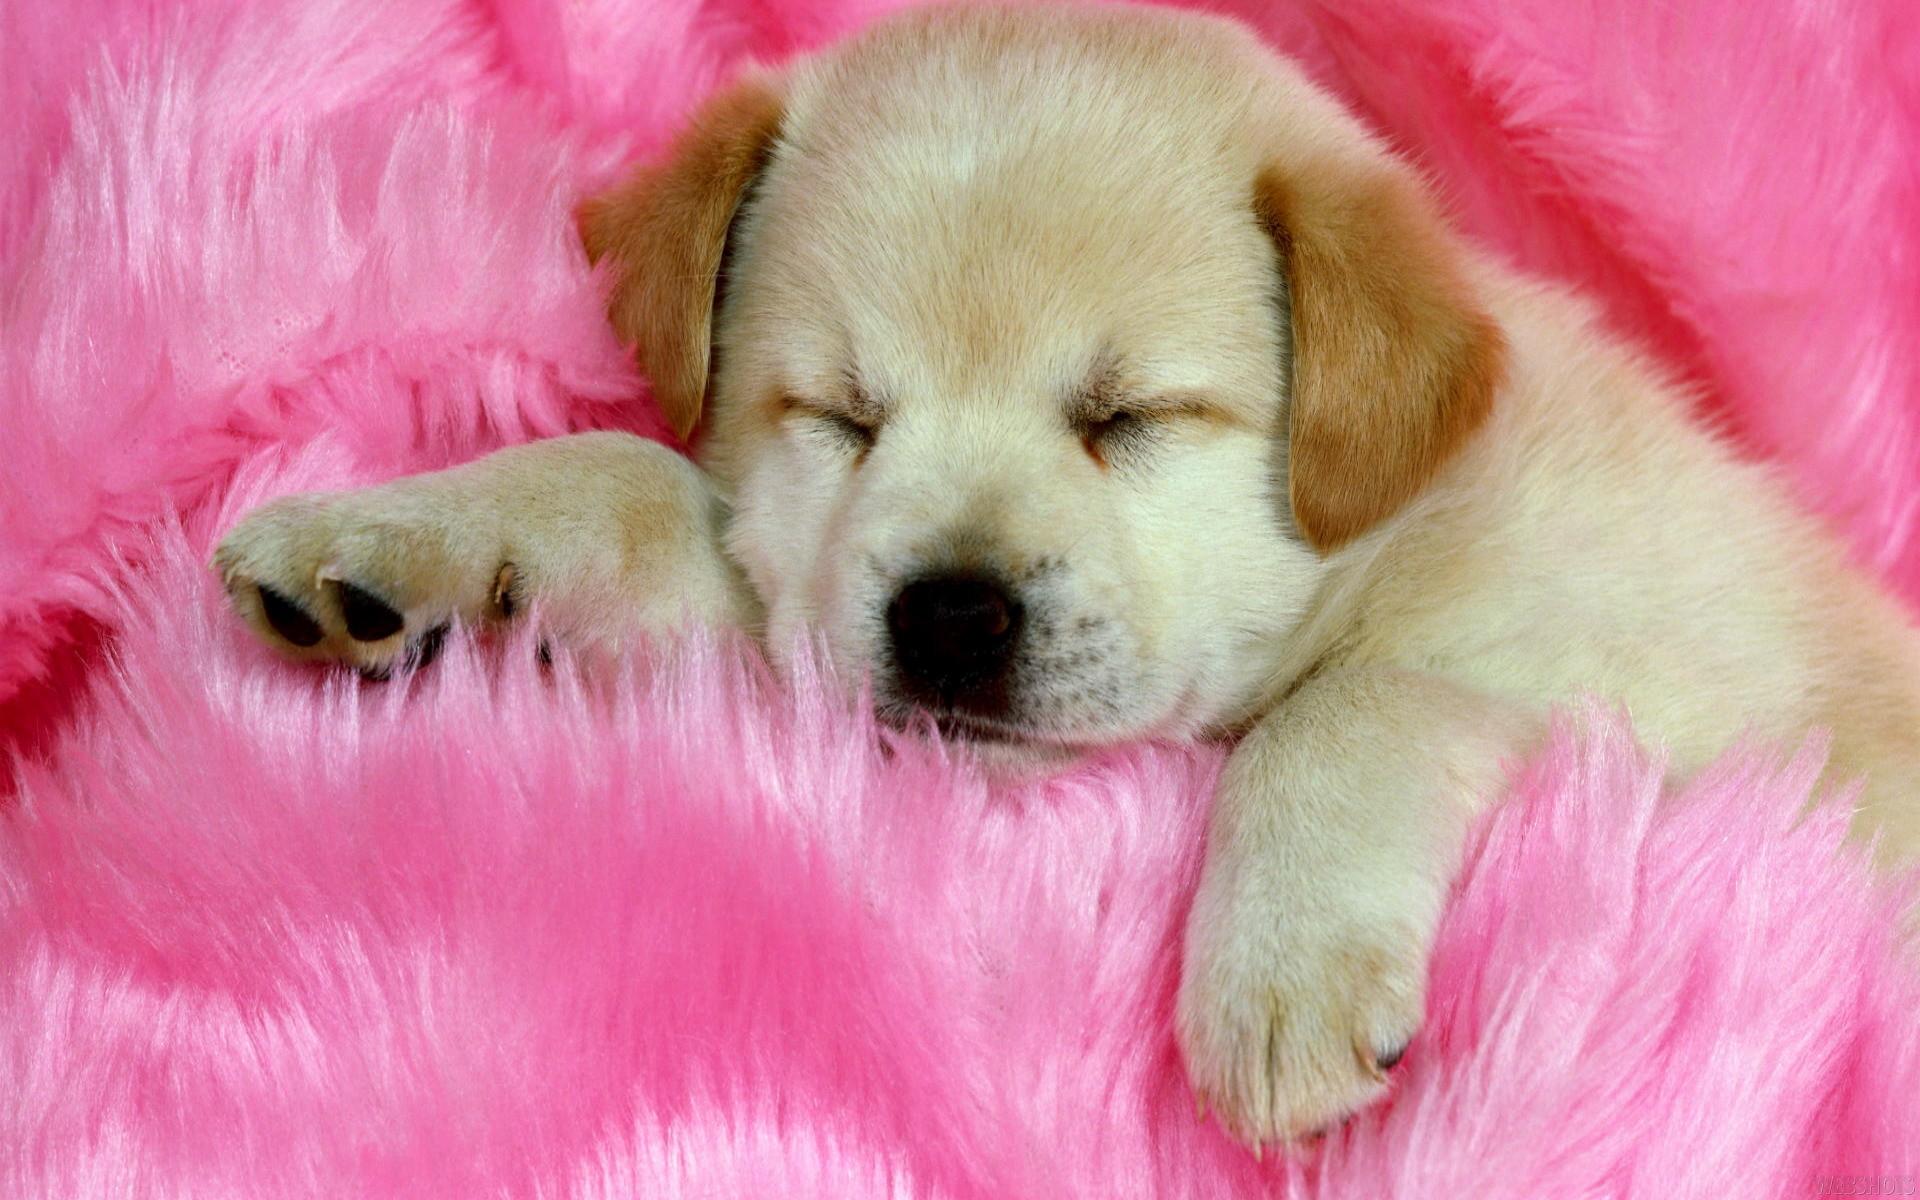 1920x1200 Cute Animal Free Wallpaper: Funny Cute Dog Sleep Hd Free Wallpaper  Source 1920x1200px